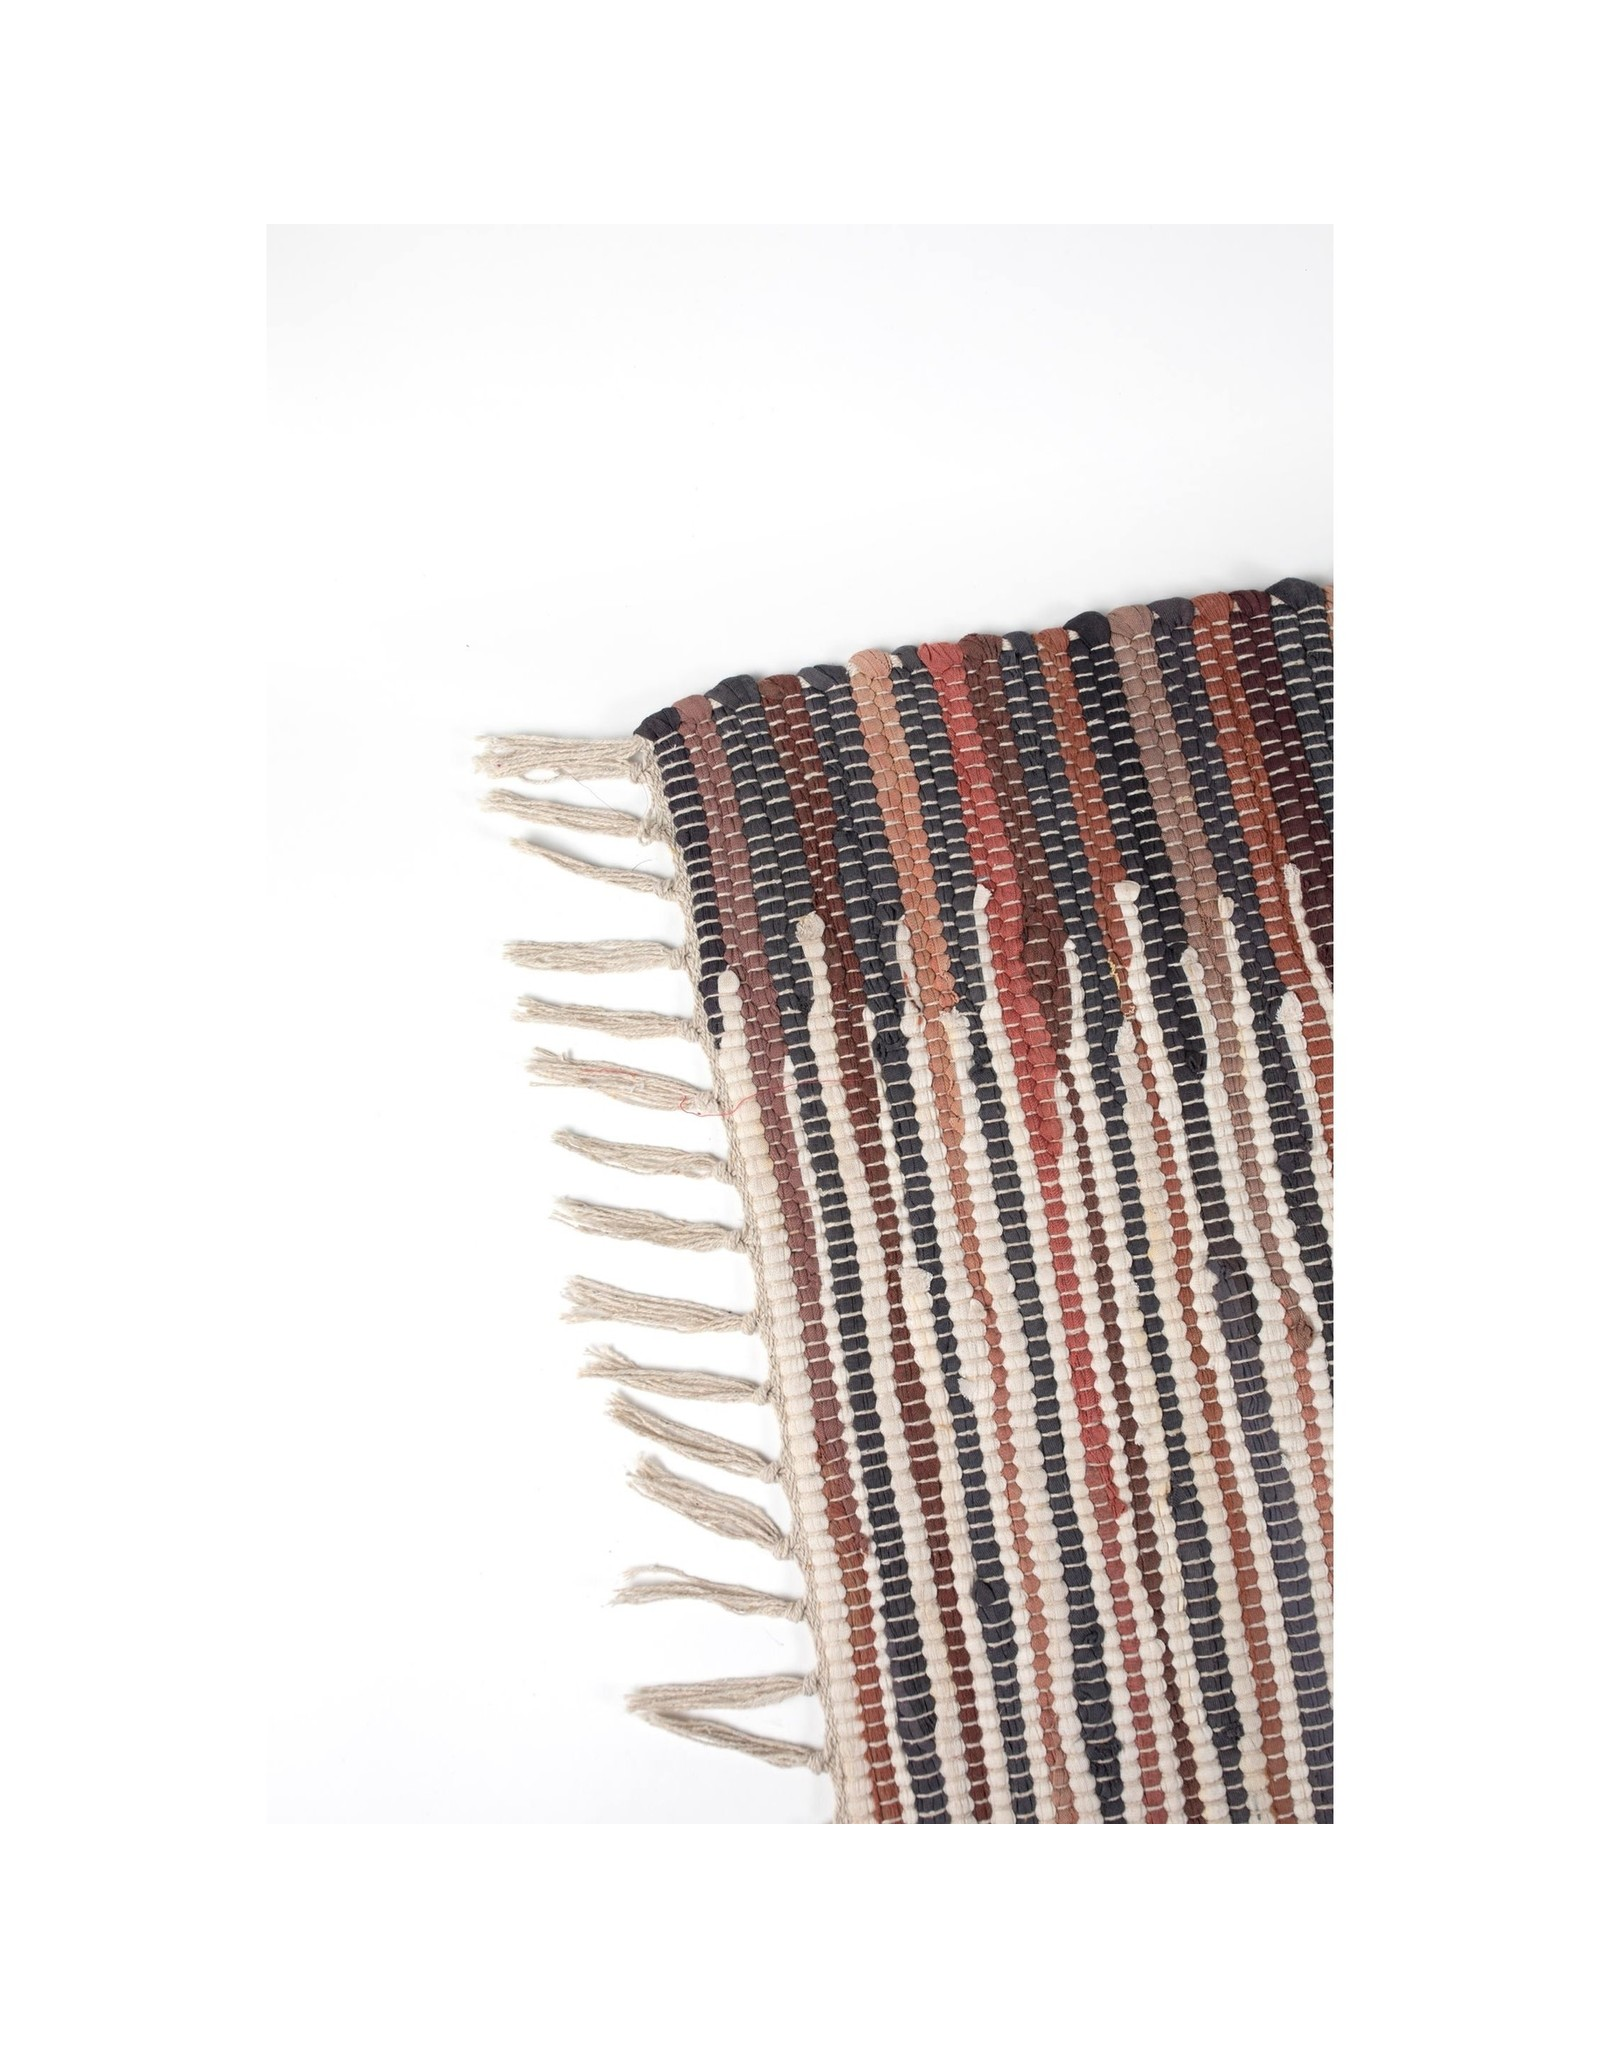 TTV USA Sunset Woven Rug, India